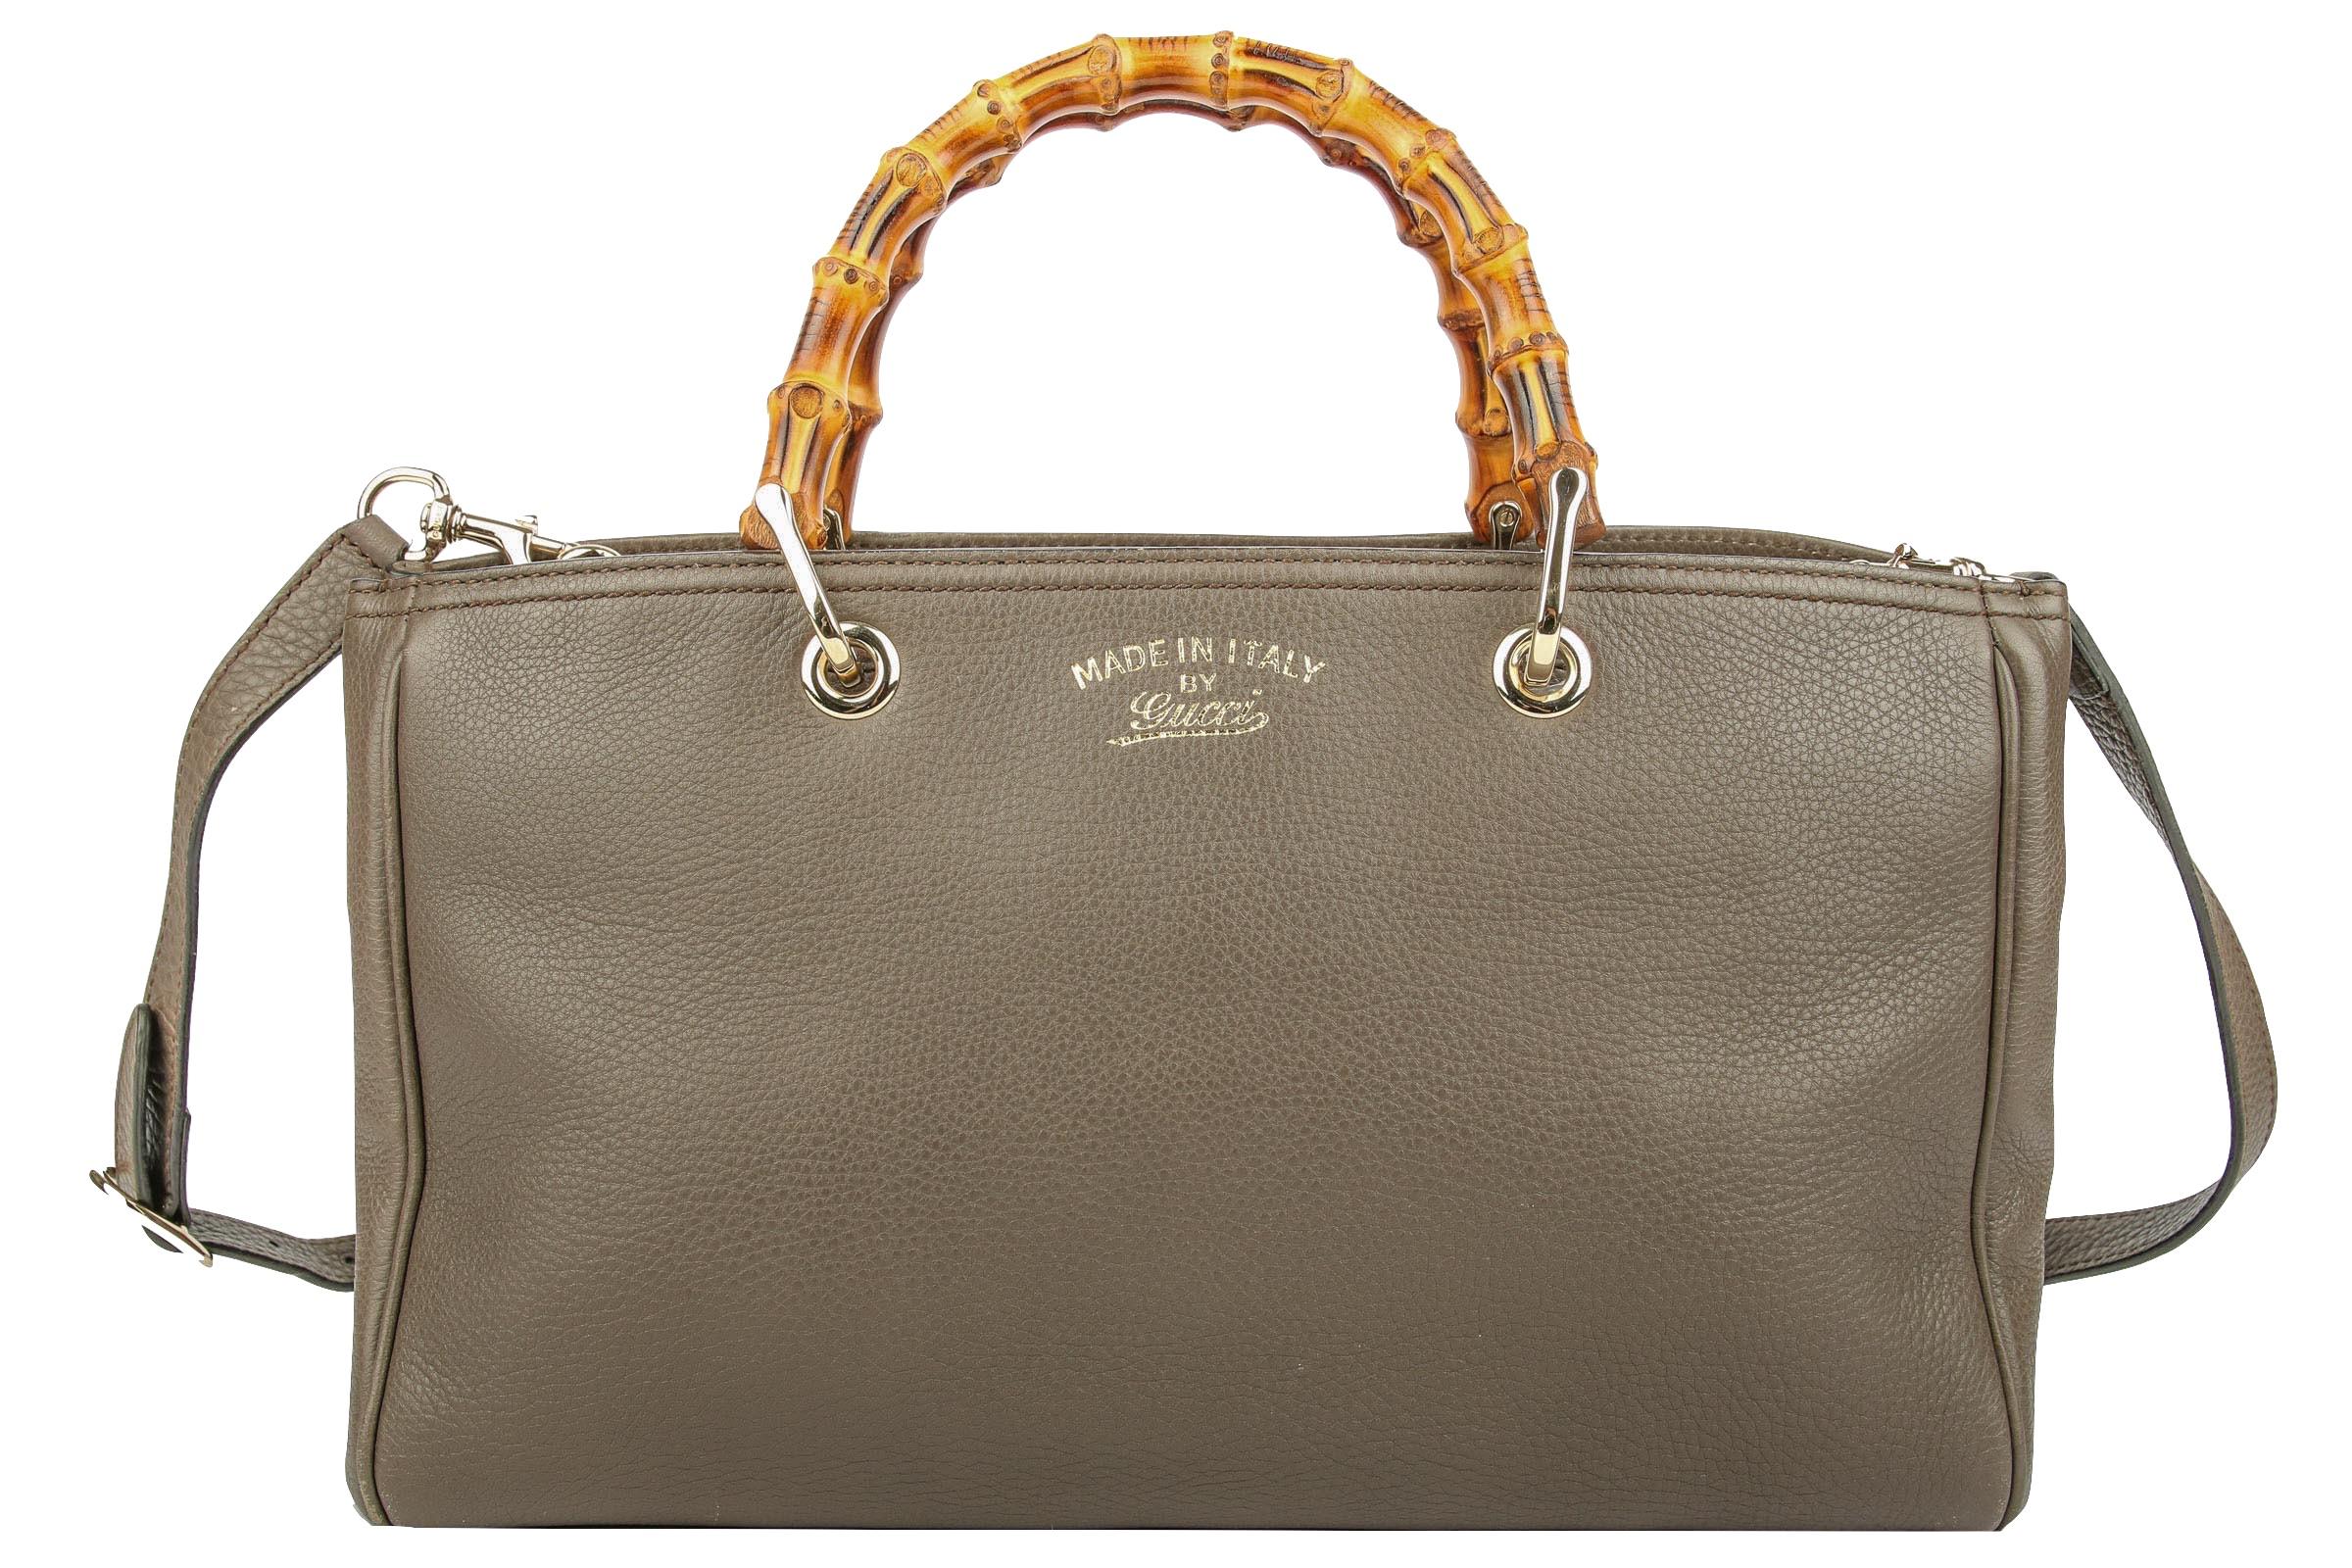 5bd2b9907c383 Gucci Handtaschen   Accessoires